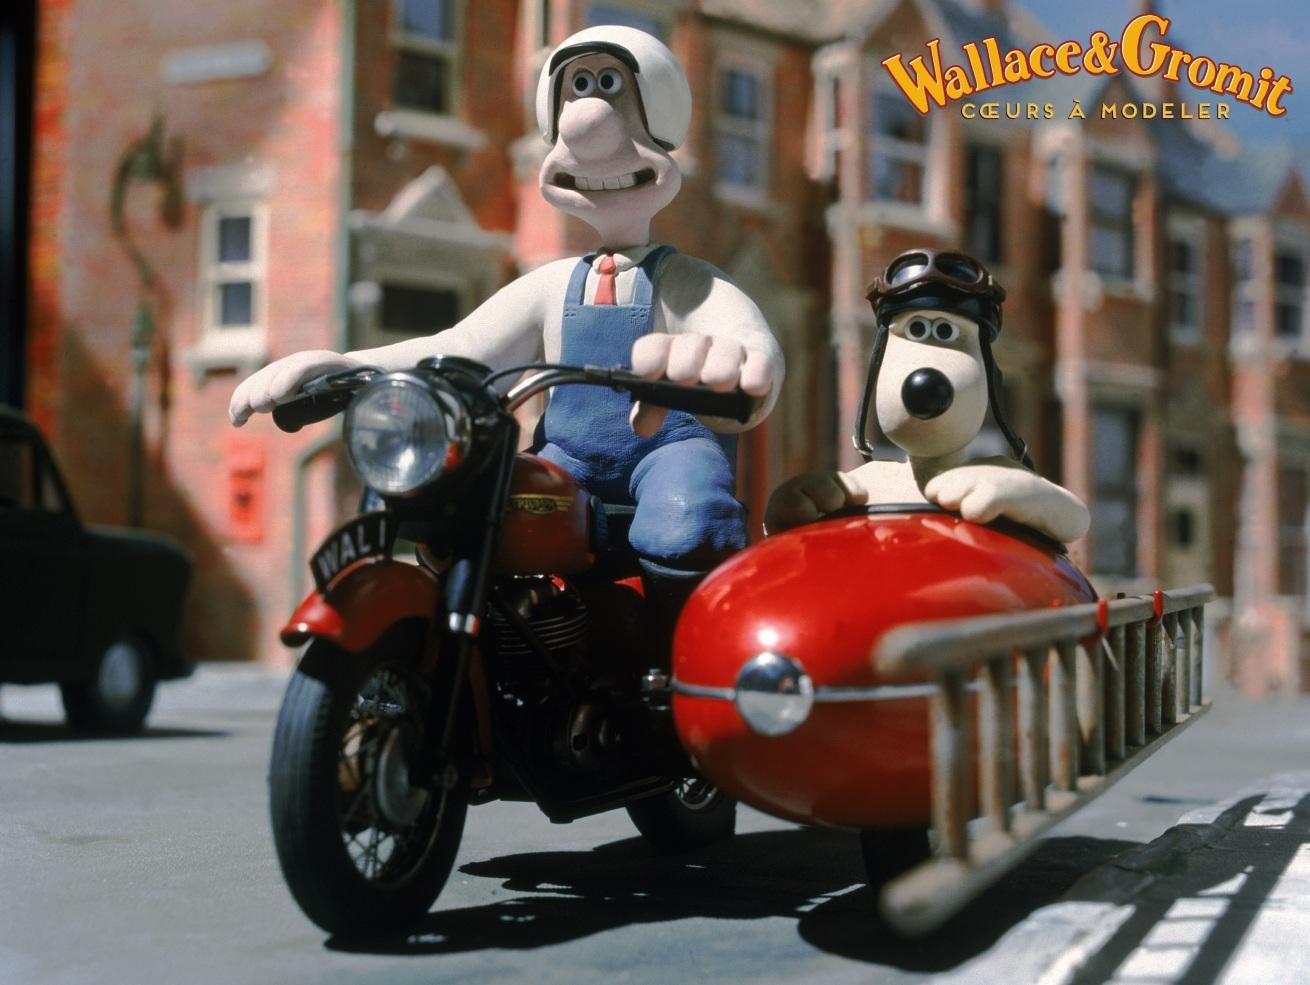 Wallace&Gromit_Cœurs-a-modeler_Rase-de-pres_1.jpg